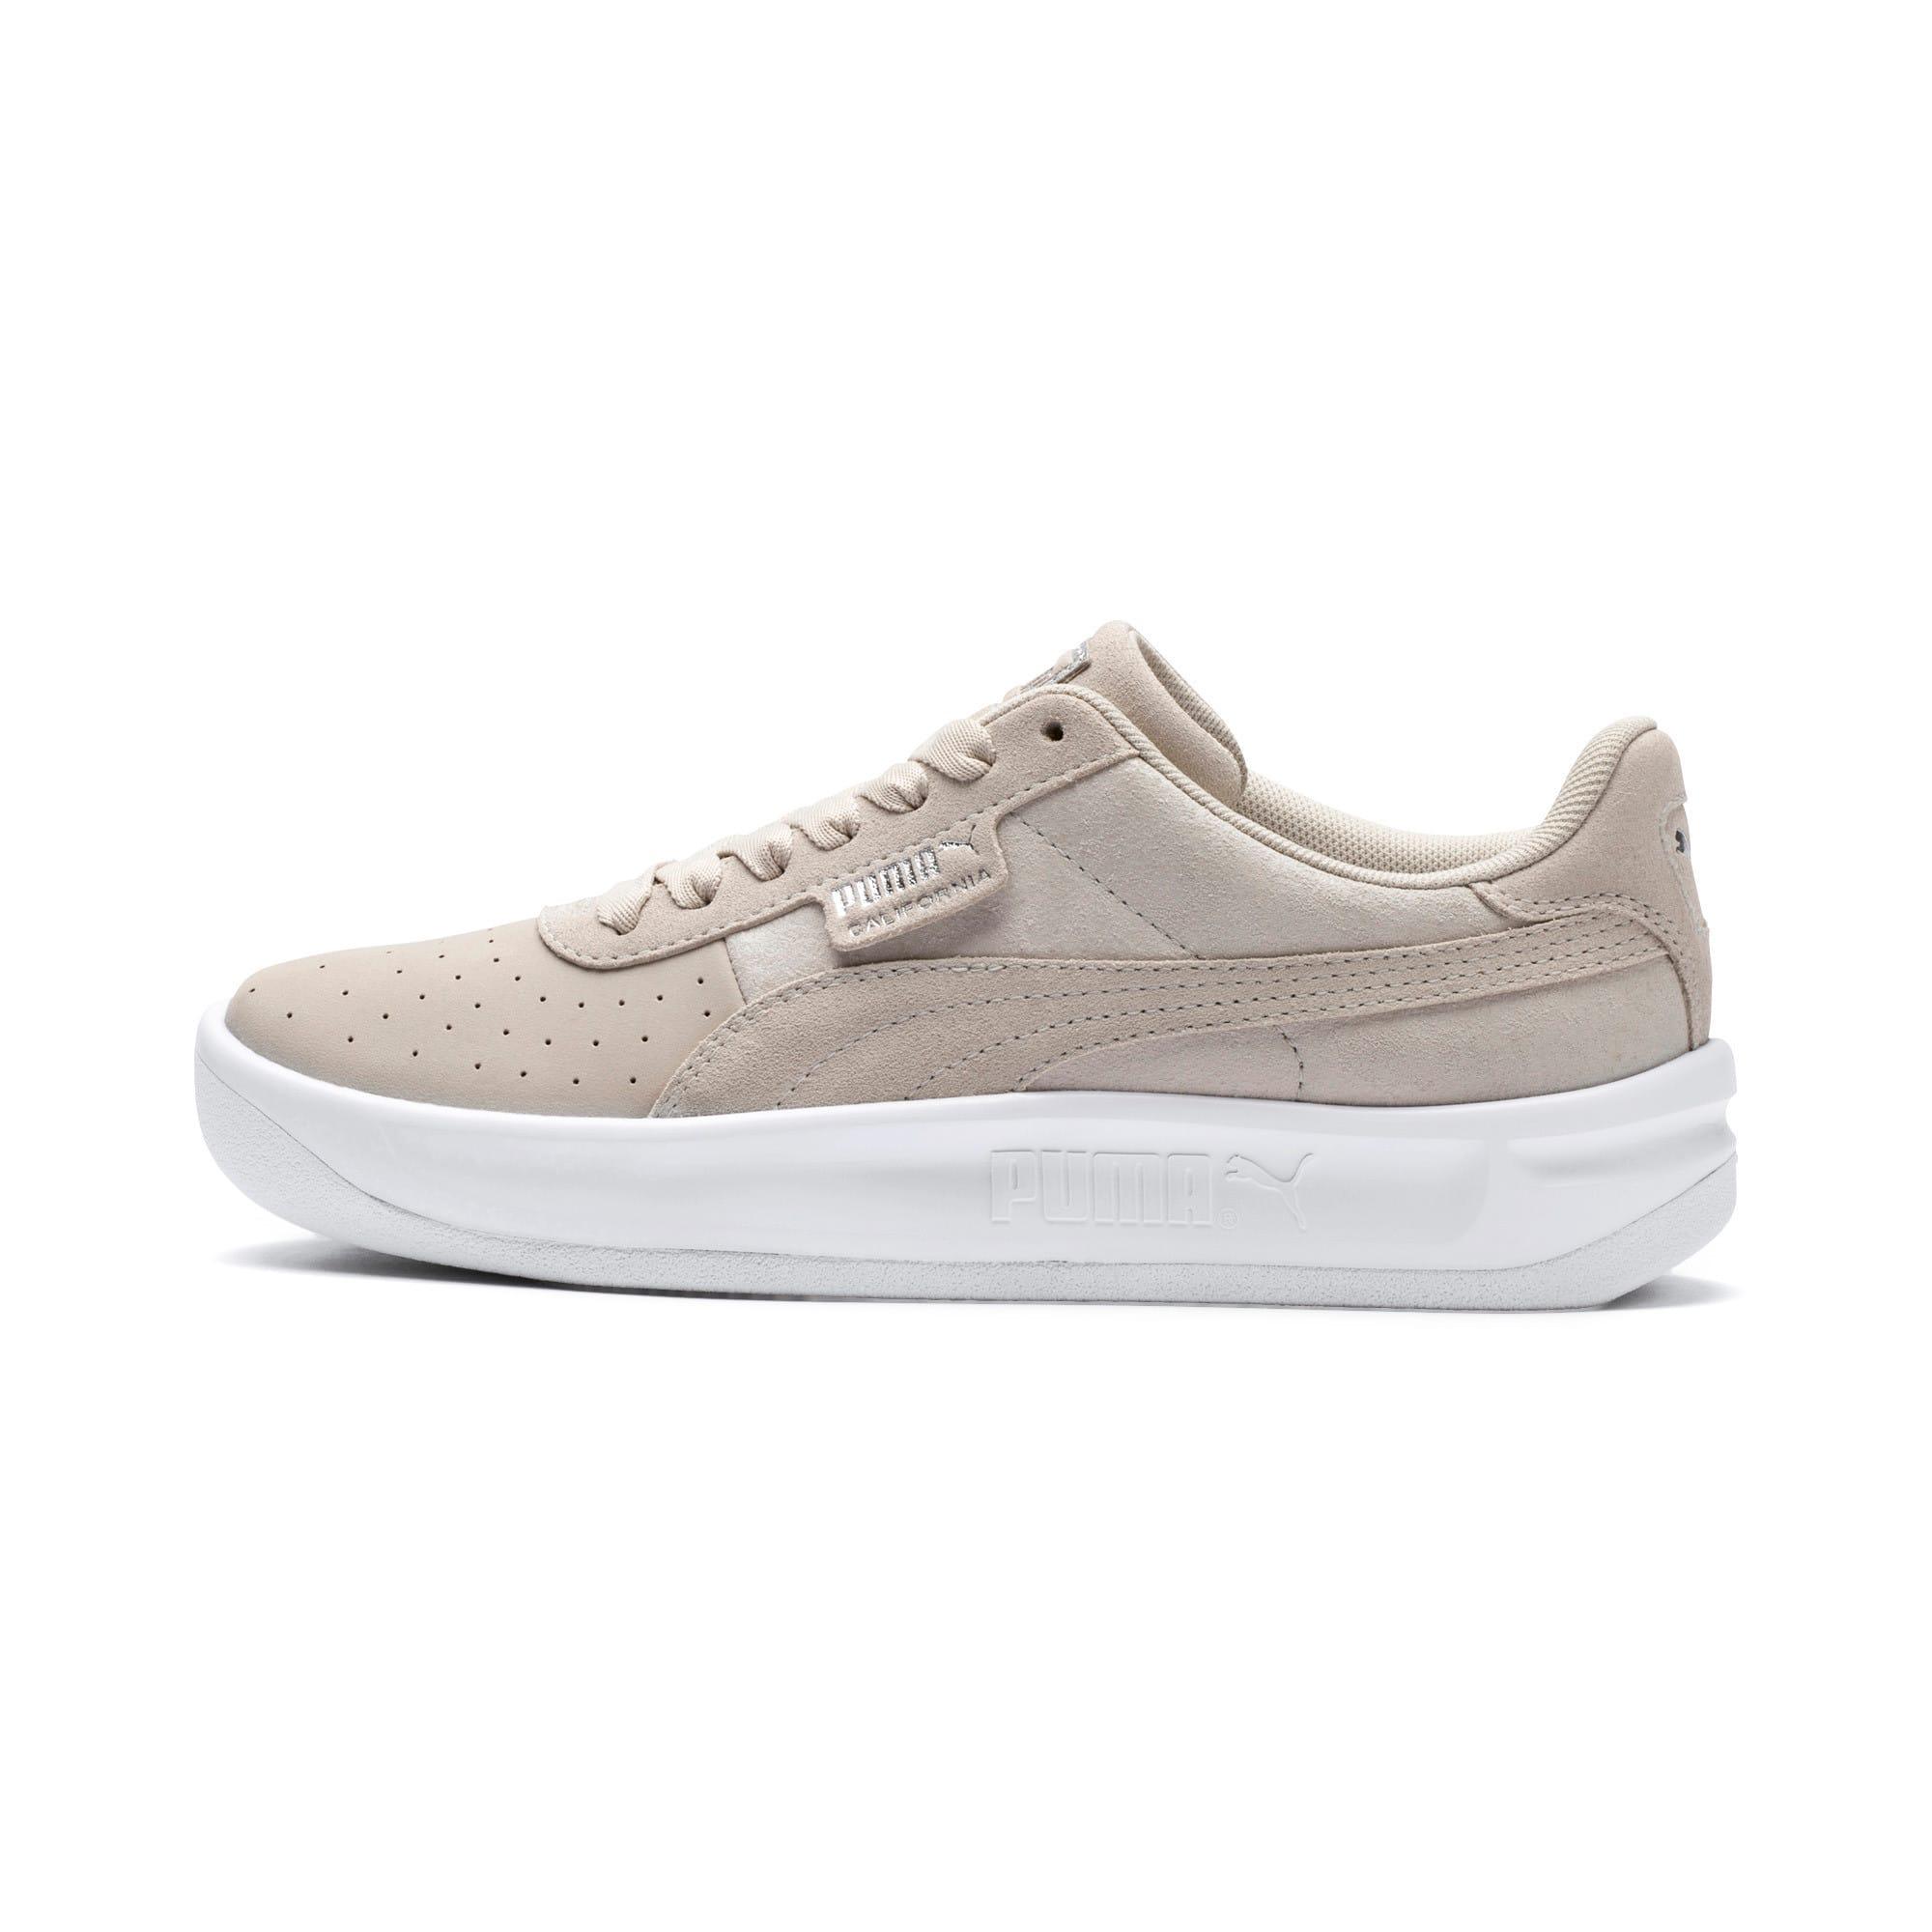 Thumbnail 1 of California Shimmer Damen Sneaker, Silver Gray-Puma Silver, medium